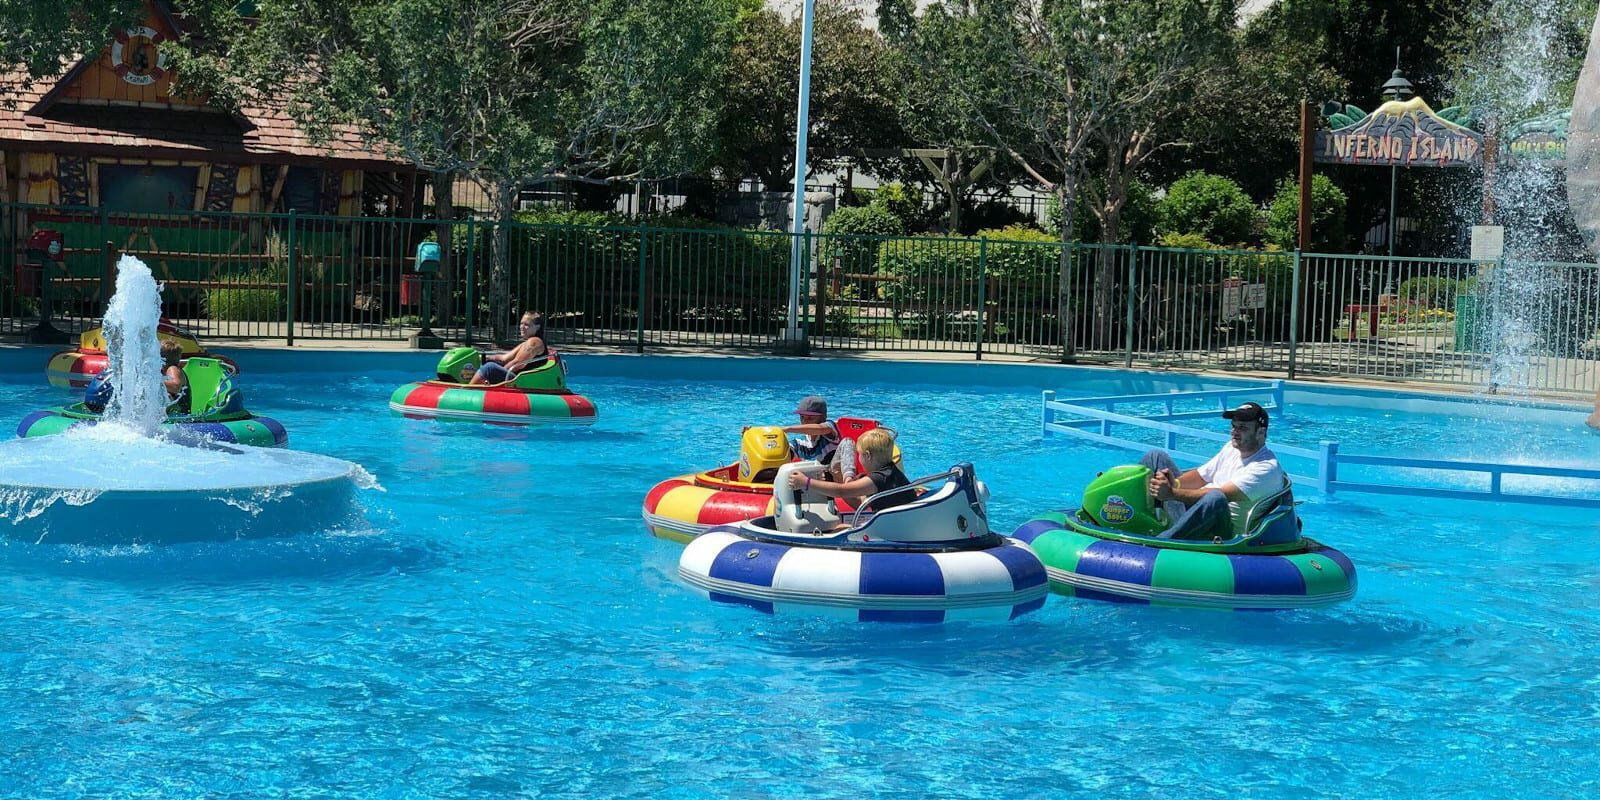 Bumper Boats in Boondocks Fun Center, CO